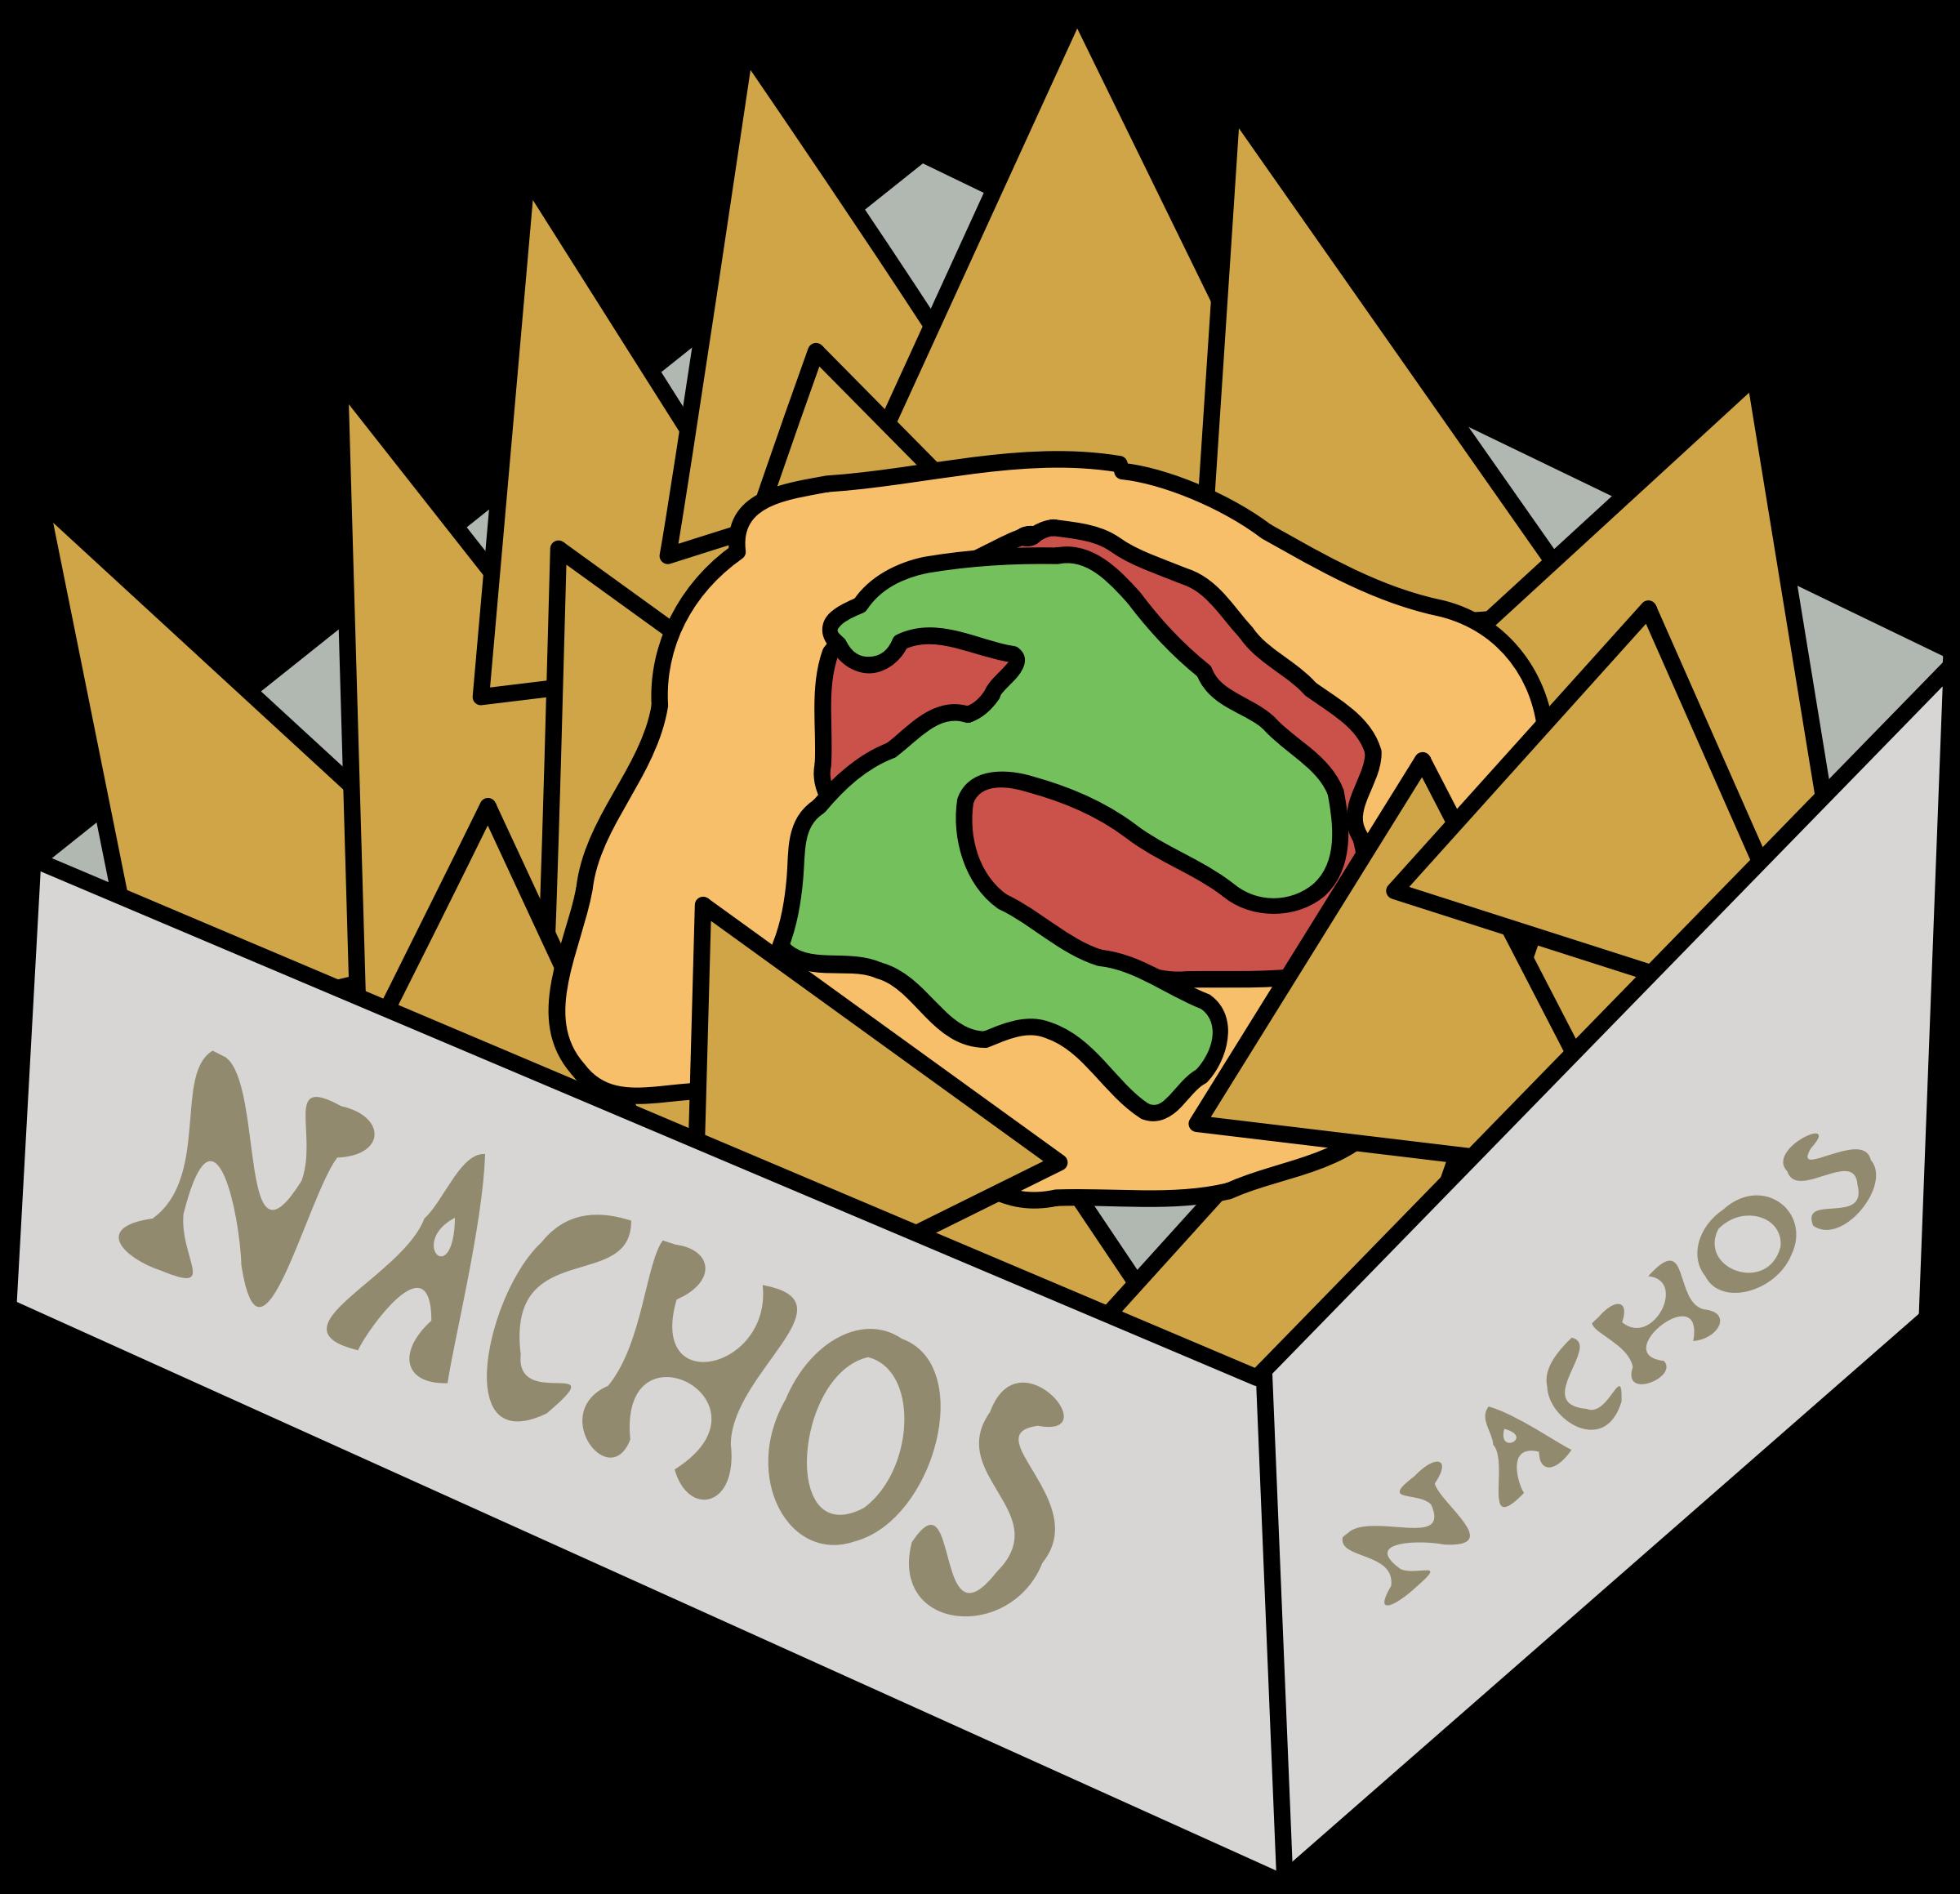 svg royalty free Nachos big image png. Nacho clipart.